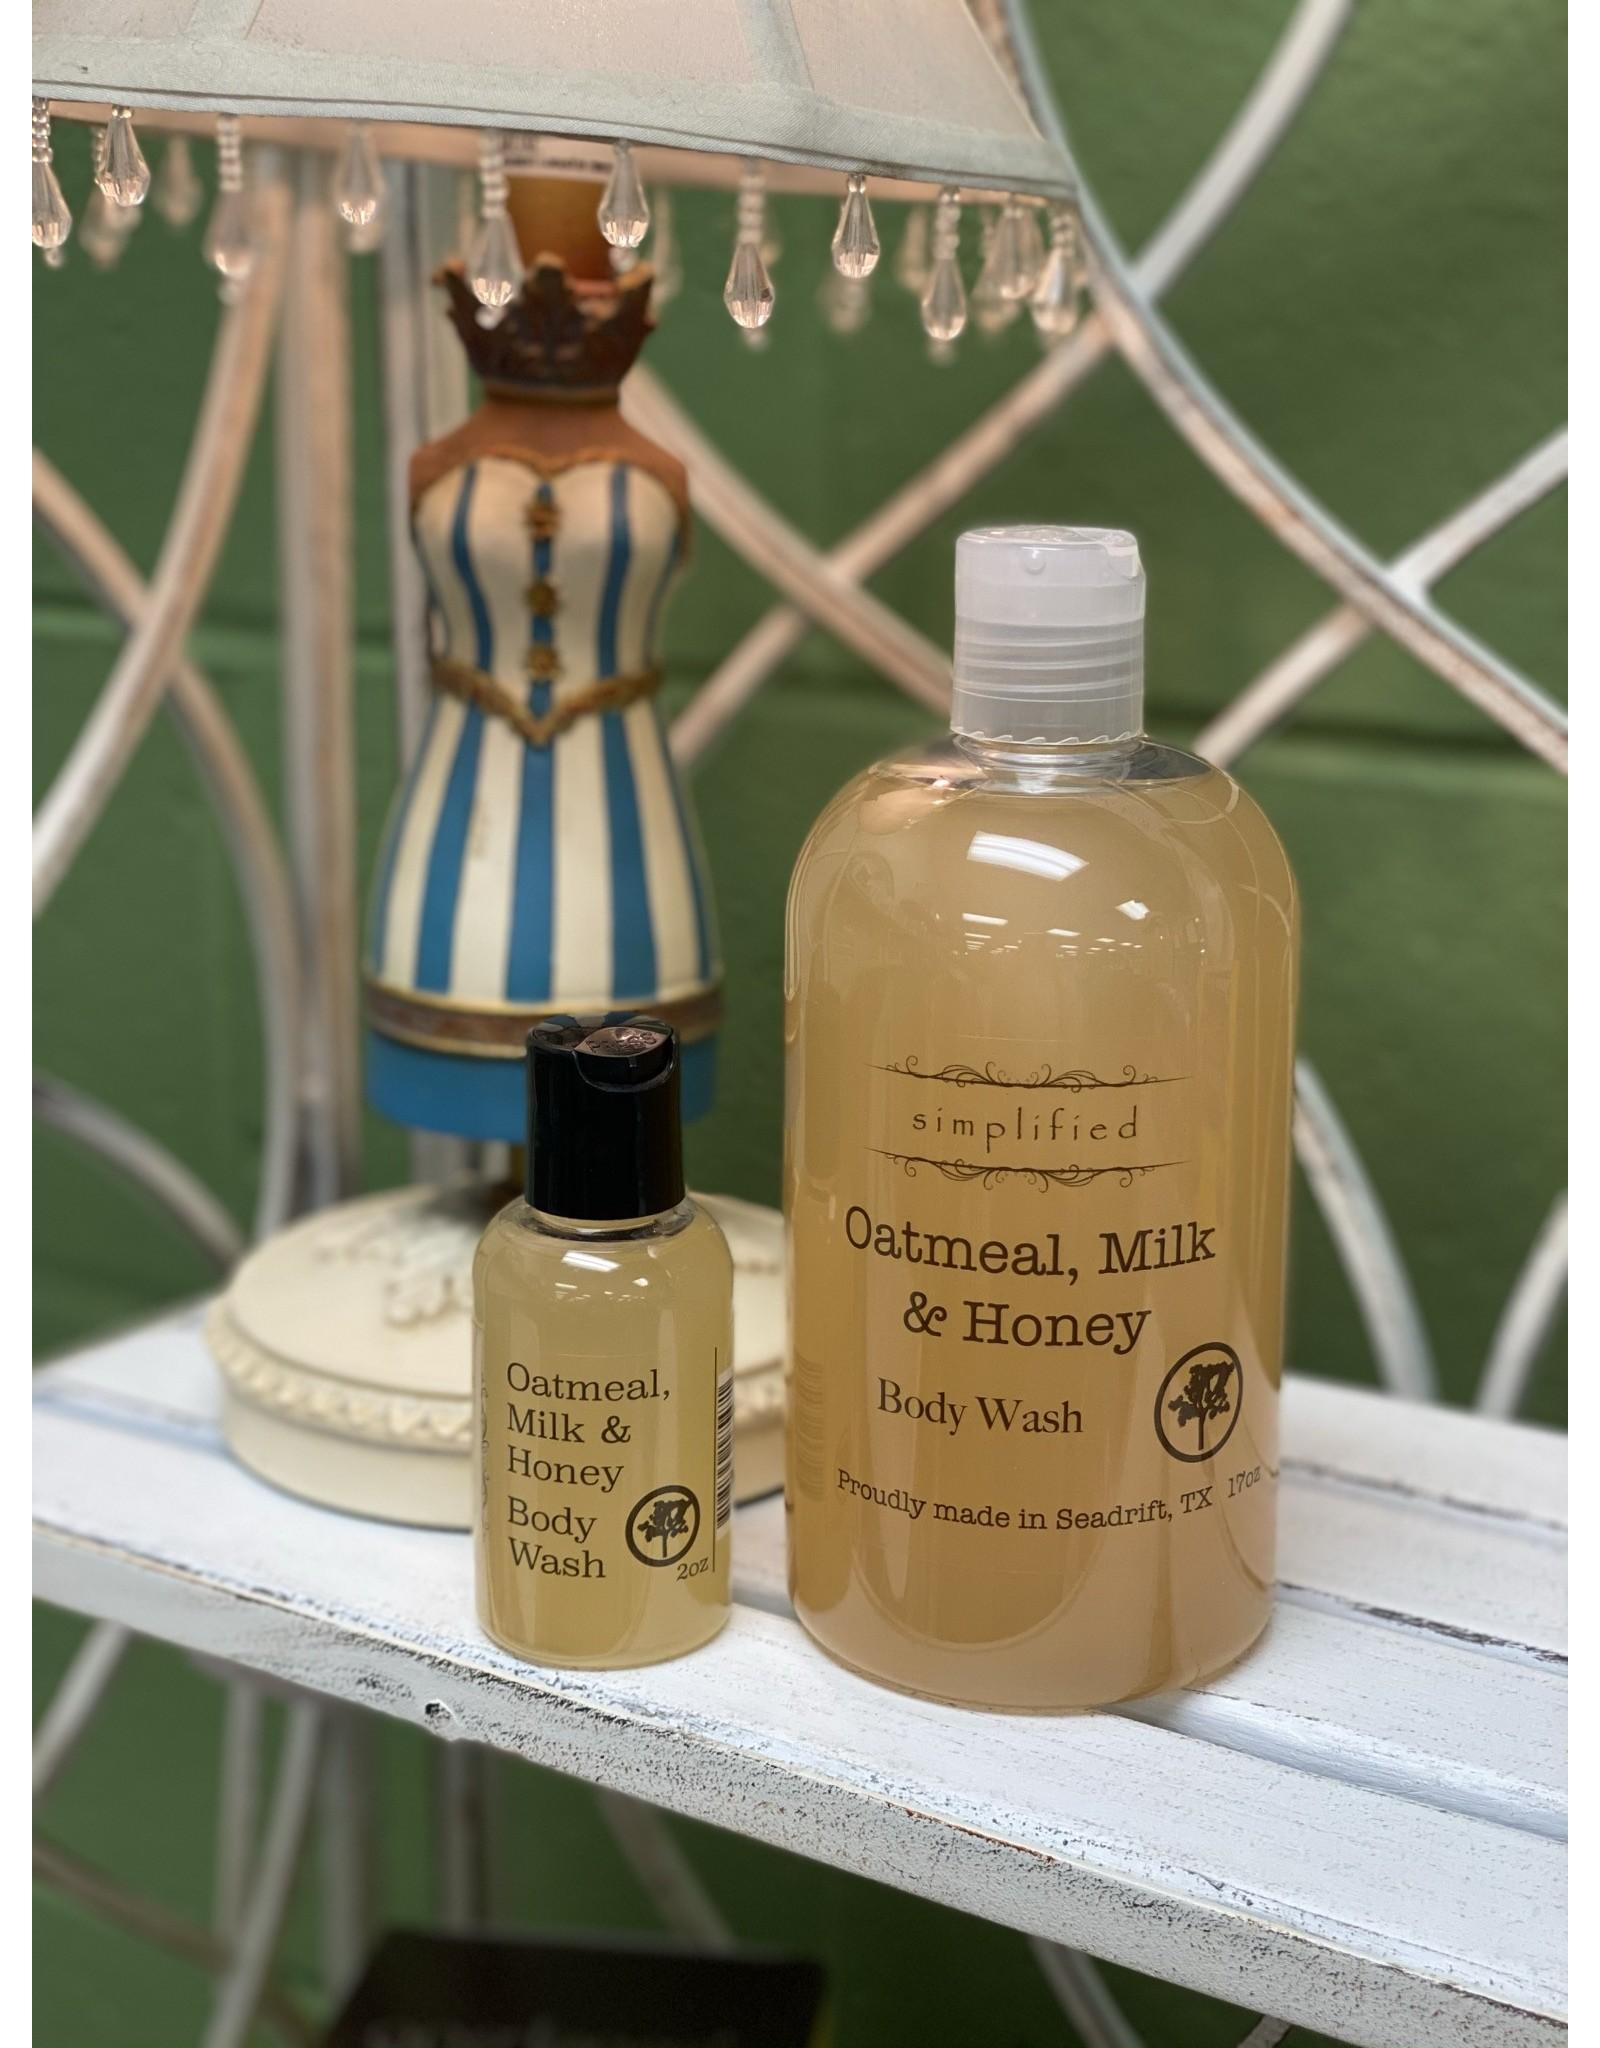 Oatmeal Milk & Honey Body Wash 2oz